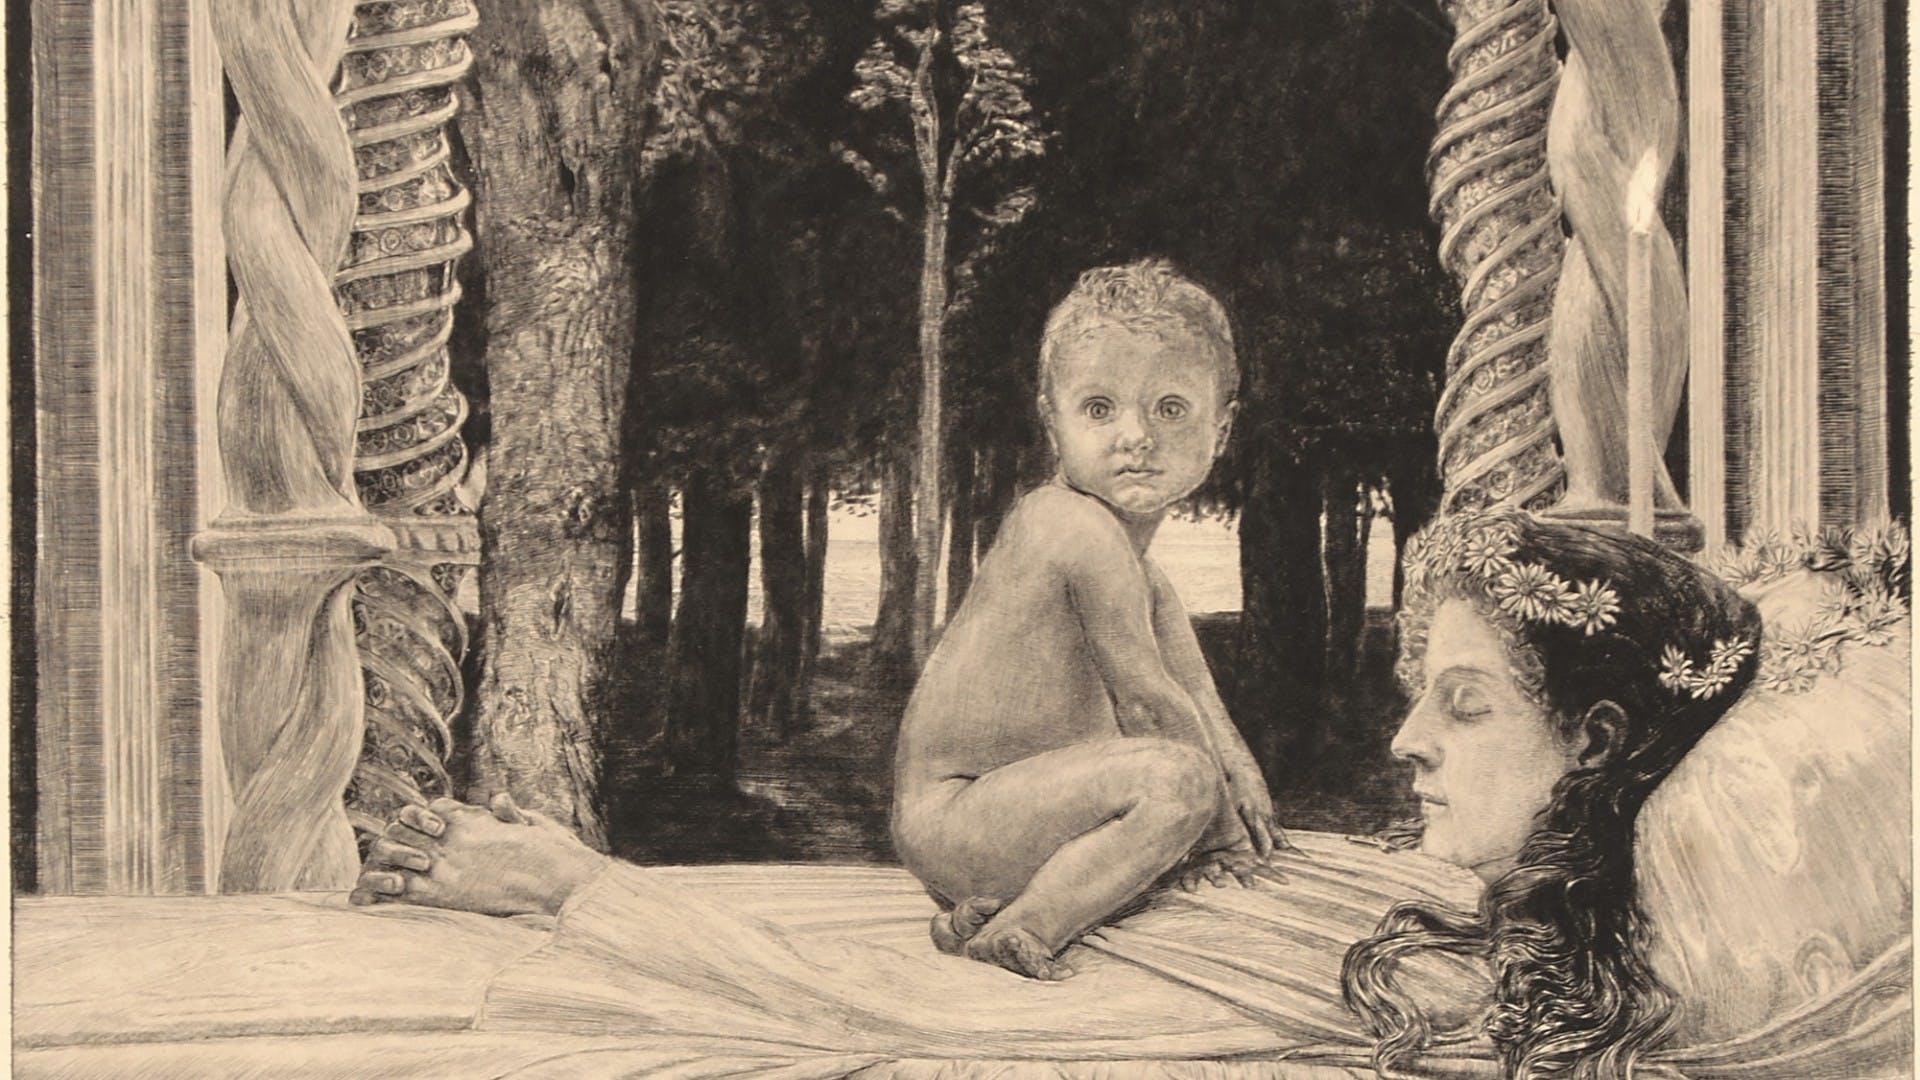 MAX KLINGER: DEAD MOTHER AND CHILD